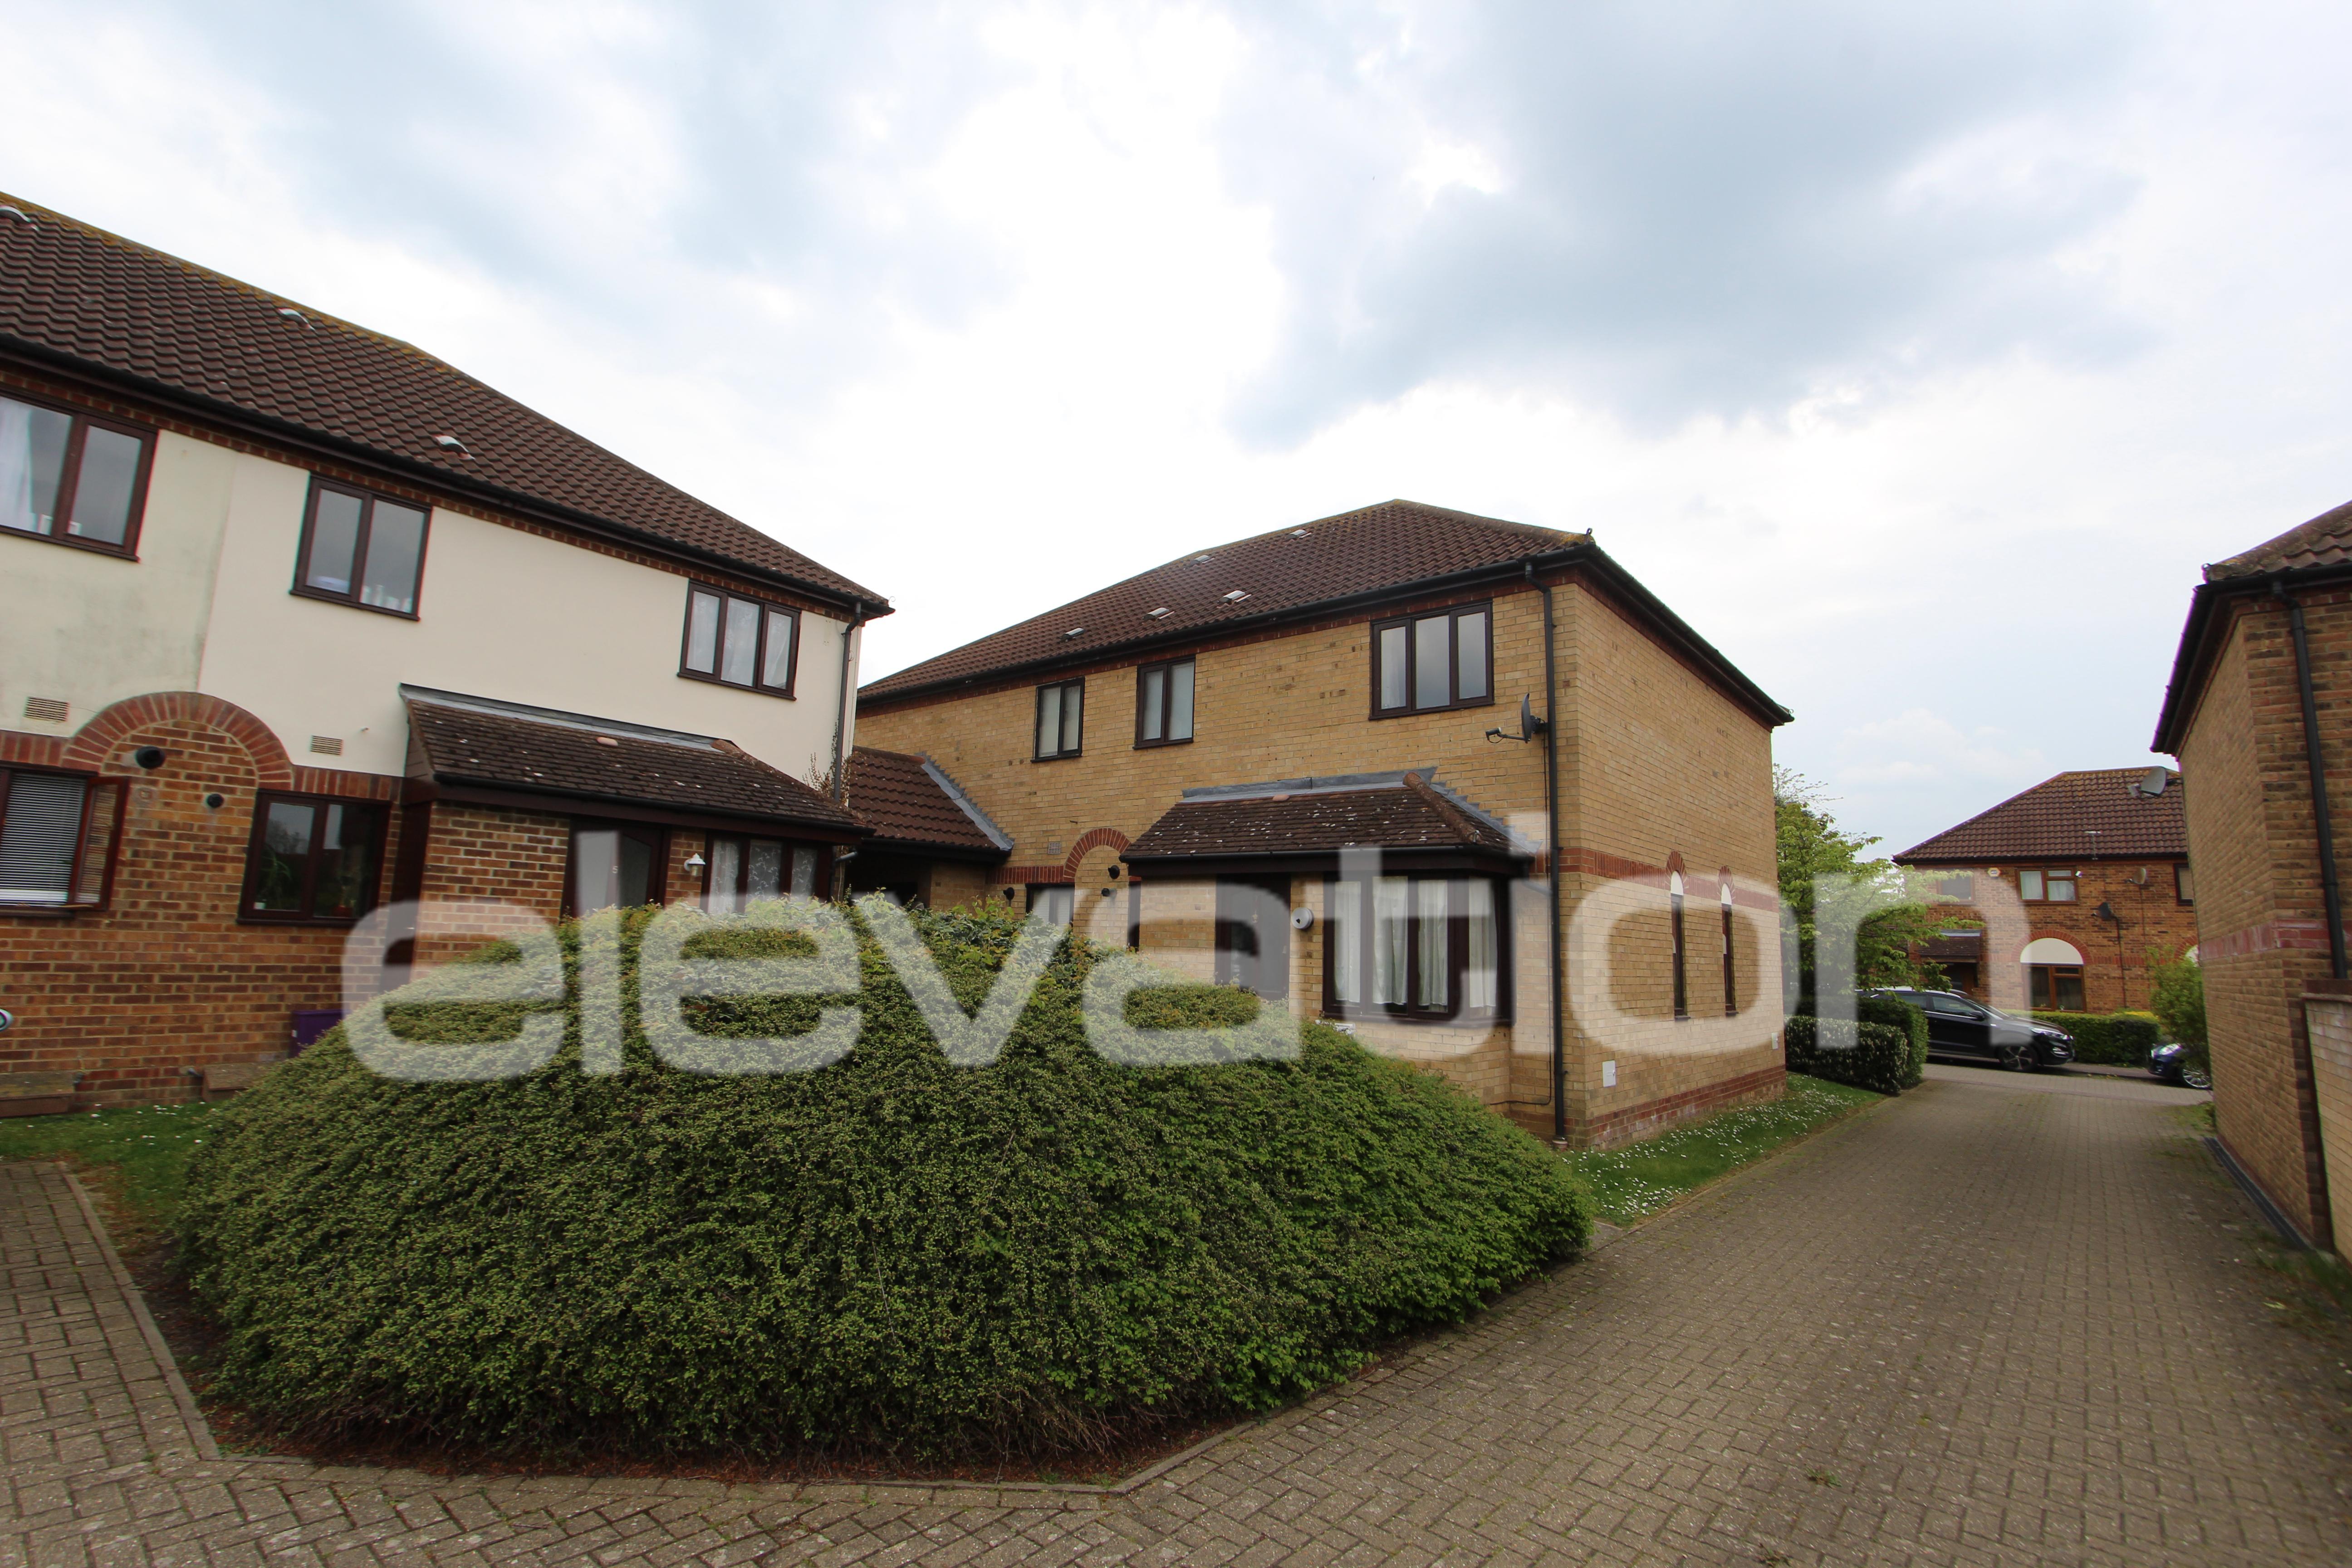 Groundsel Close, Milton Keynes, Buckinghamshire Image